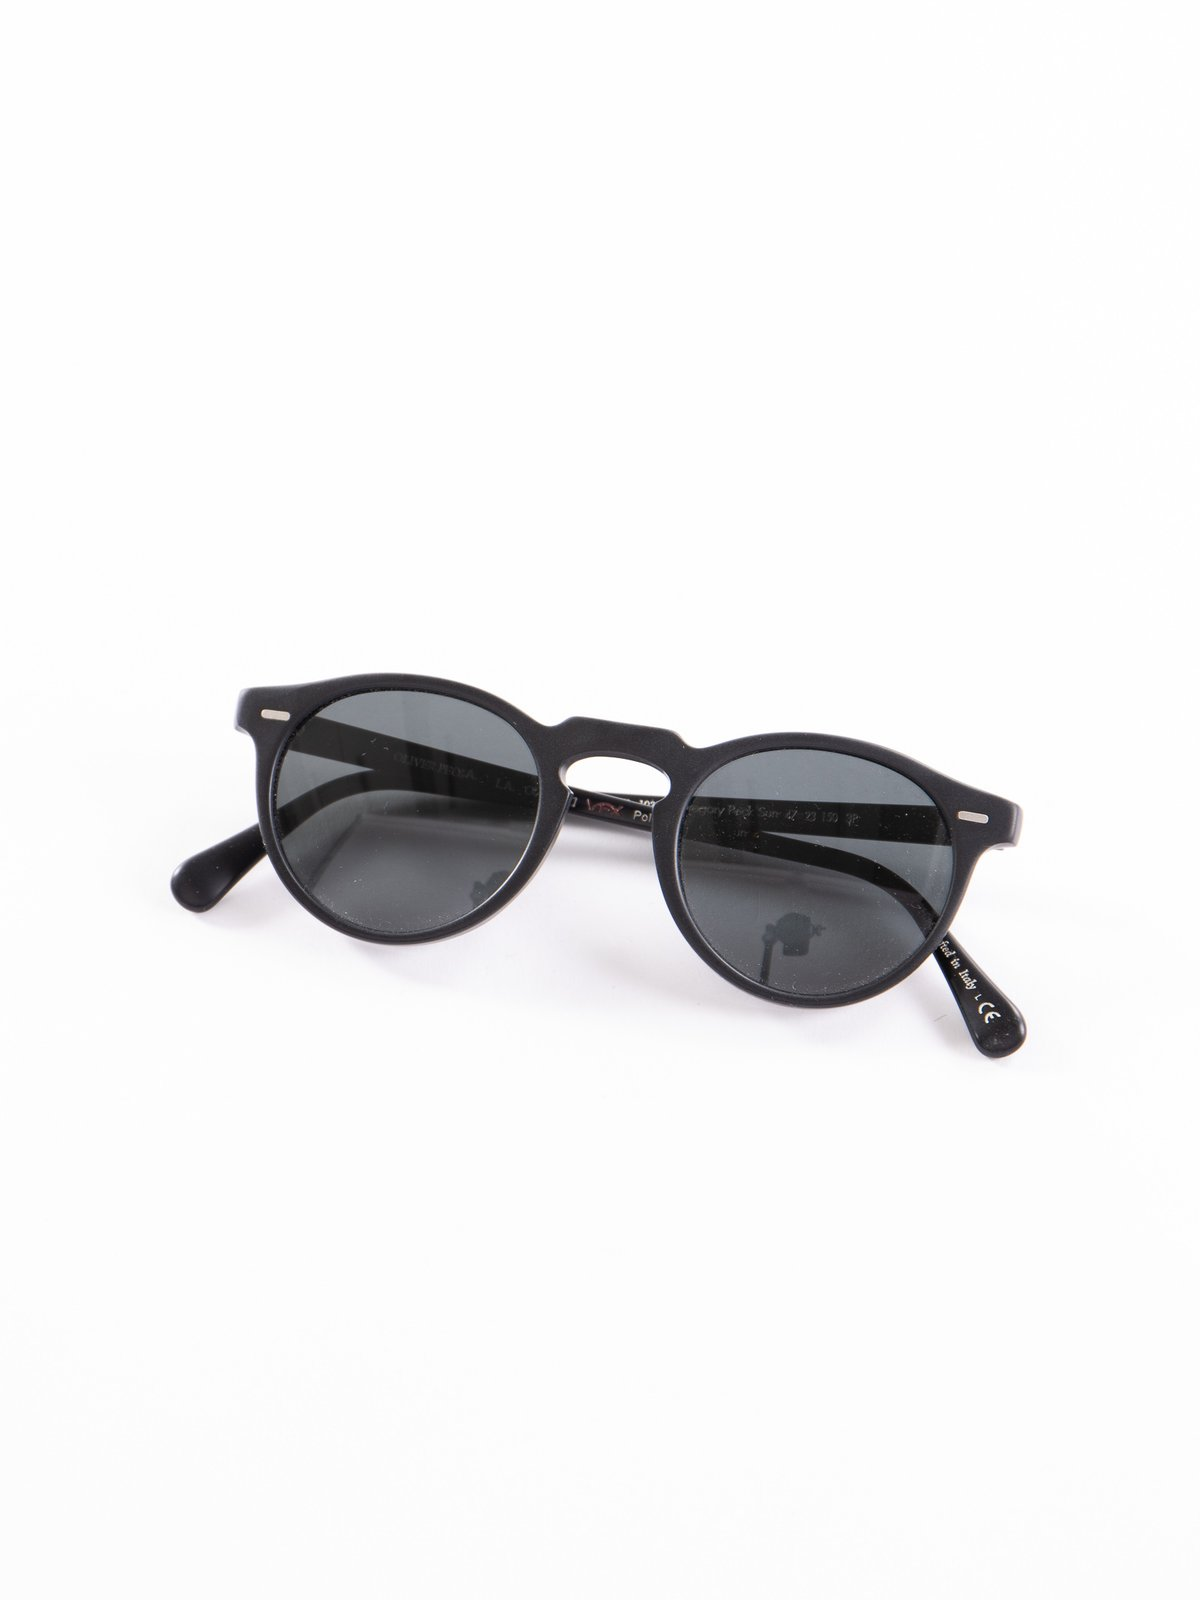 Semi–Matte Black/Dark Grey Polar Gregory Peck Sunglasses - Image 1